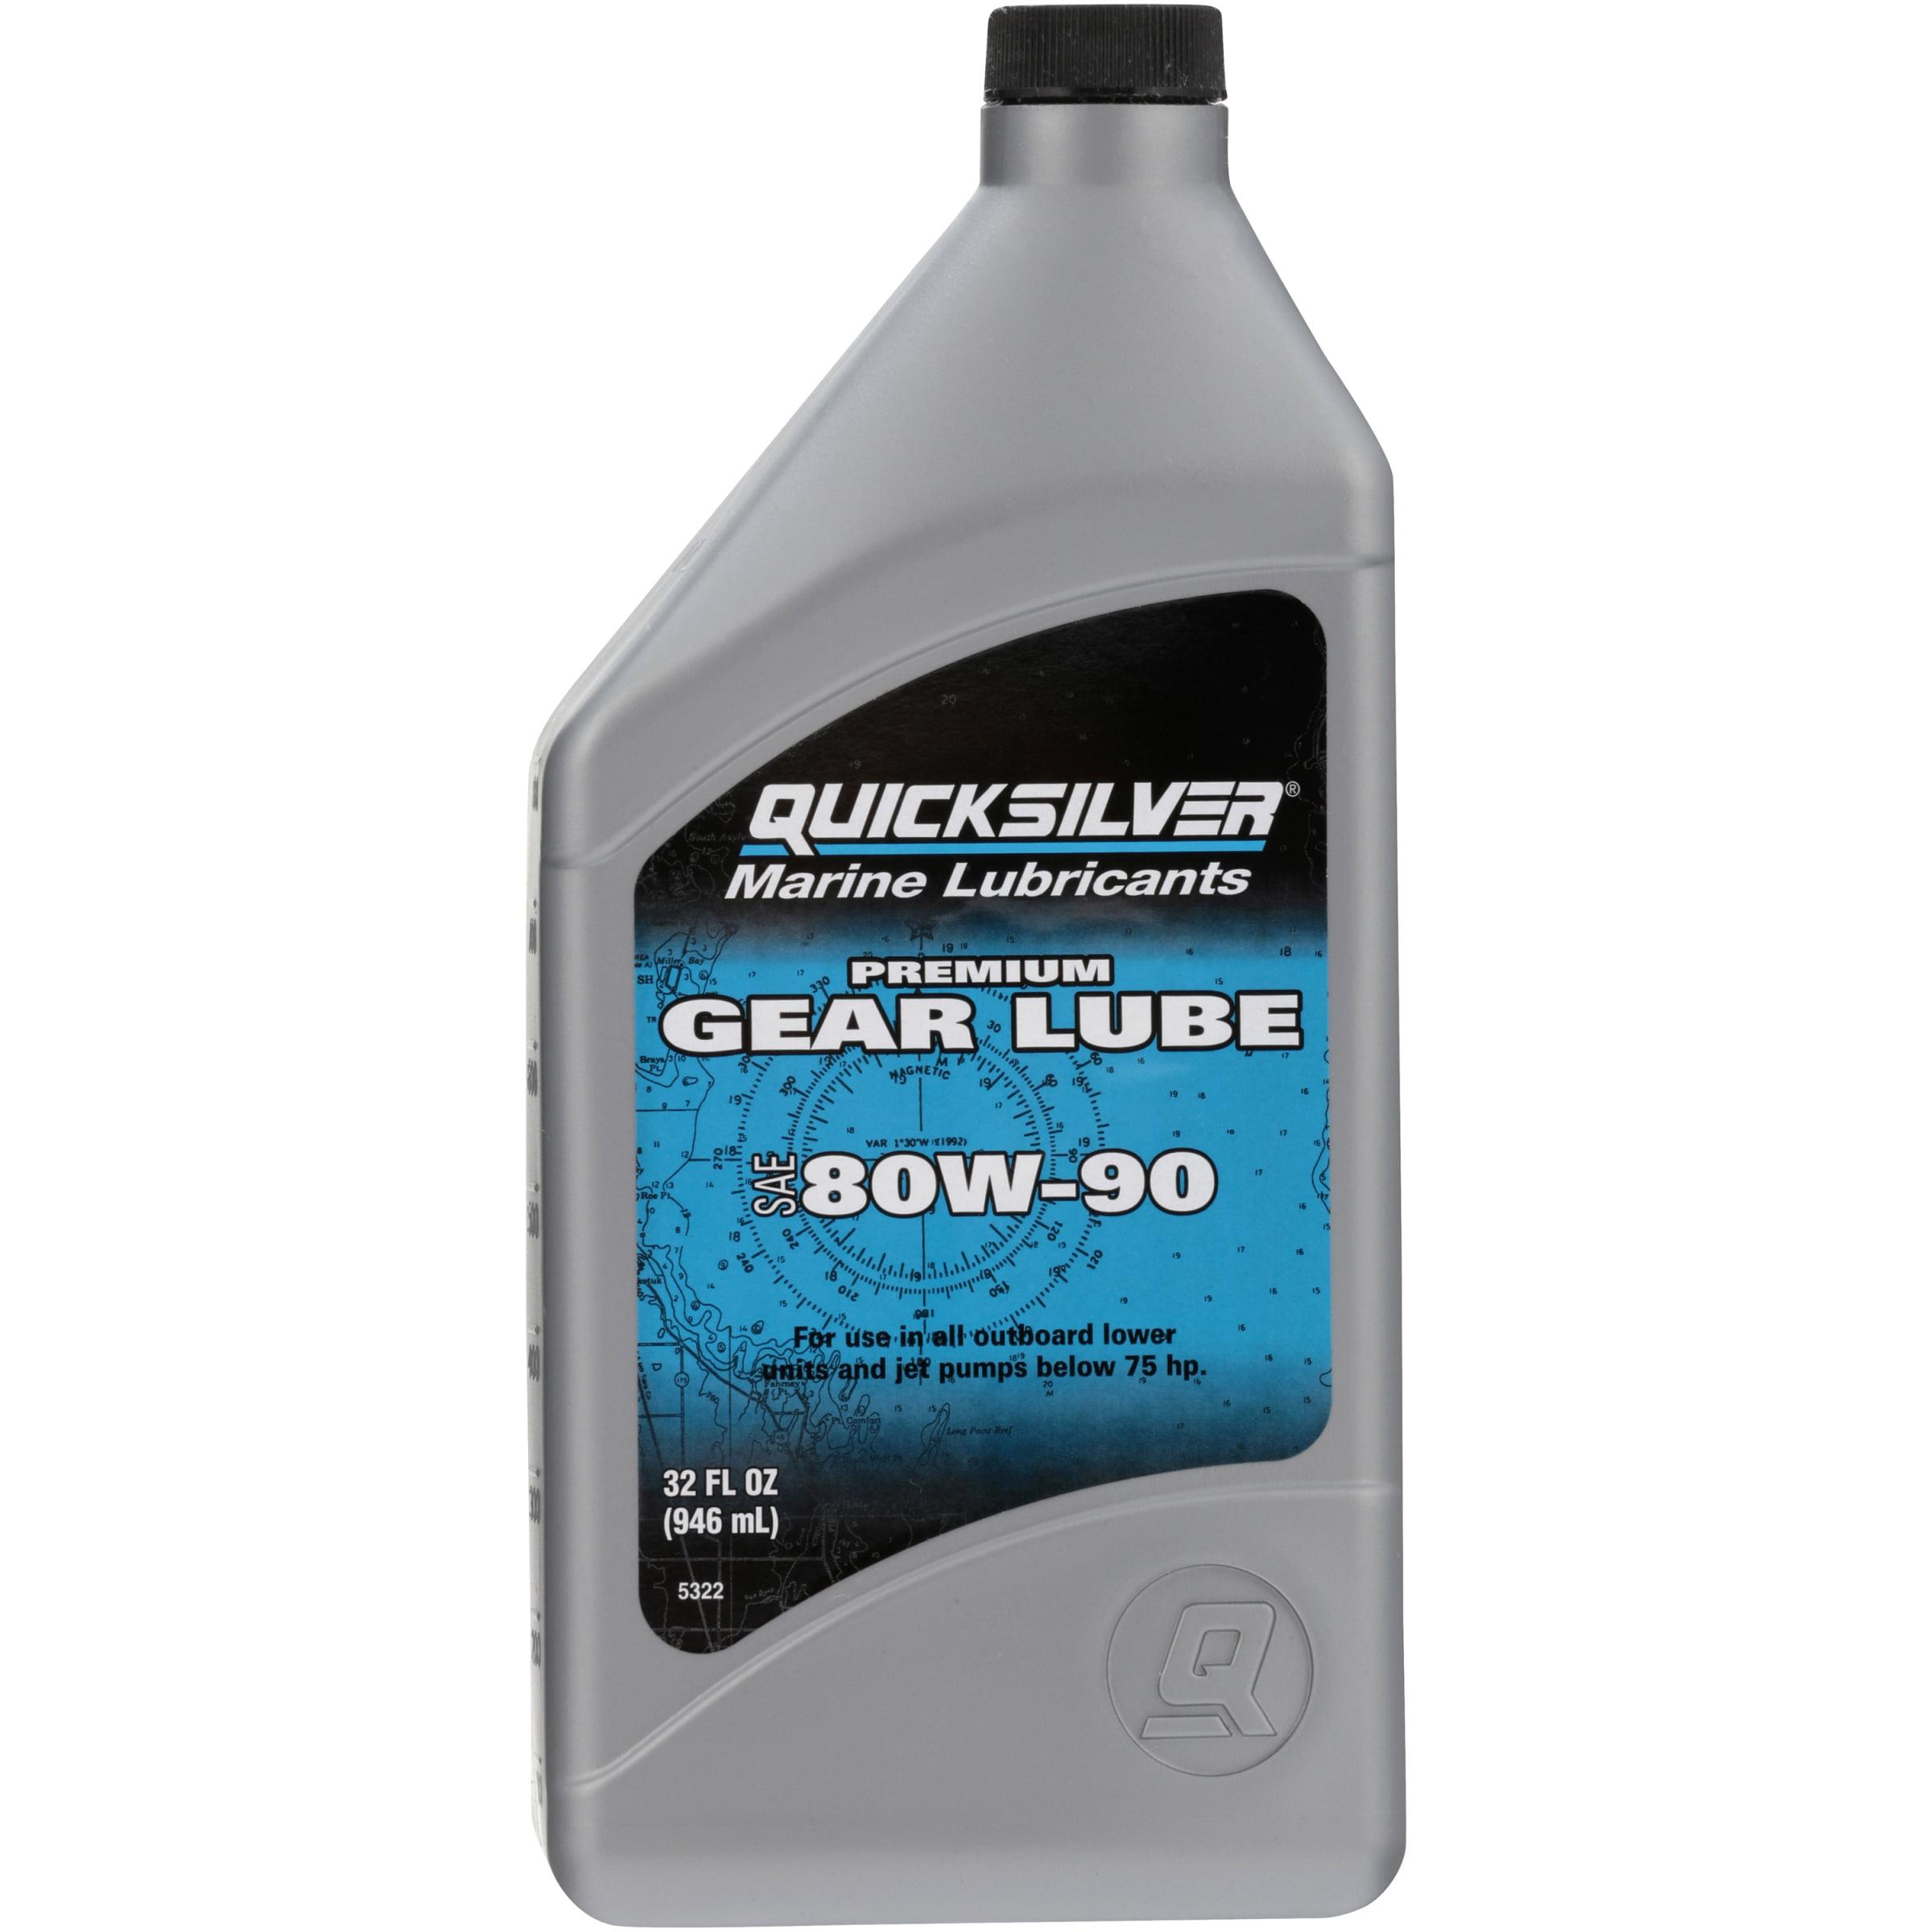 Mercury Premium 80w - 90 Gear Lube, 32 oz.